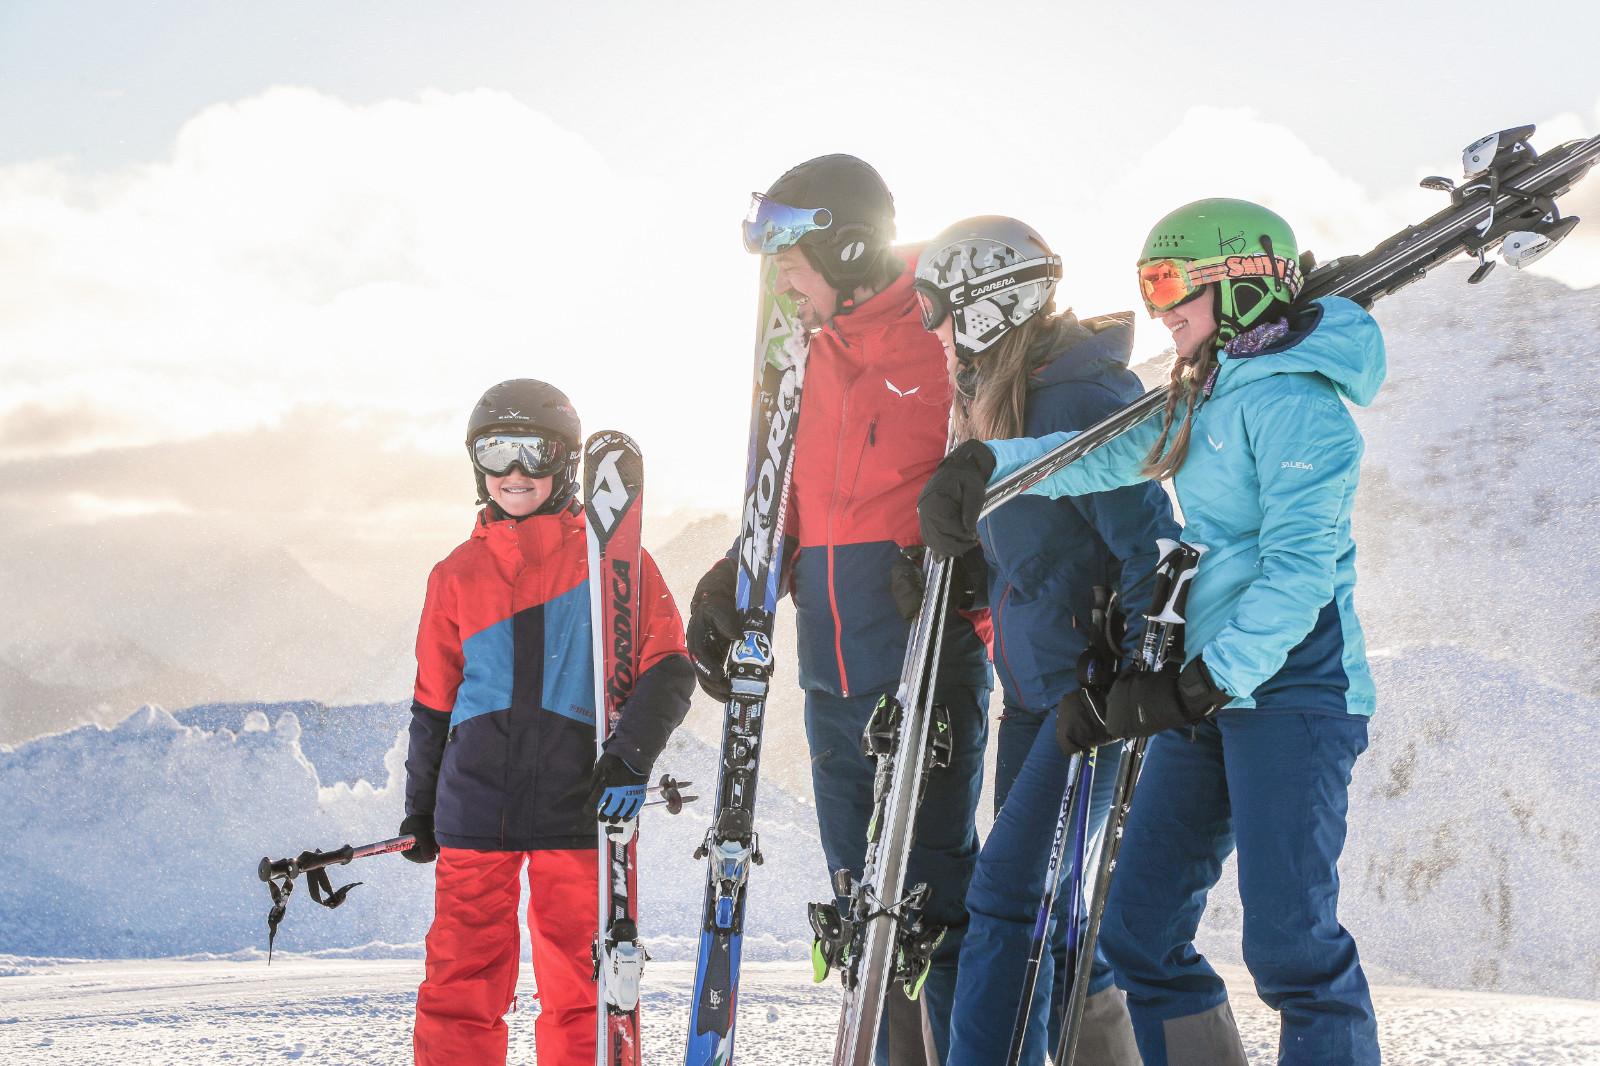 Familien Skifahren in Westendorf SkiWelt